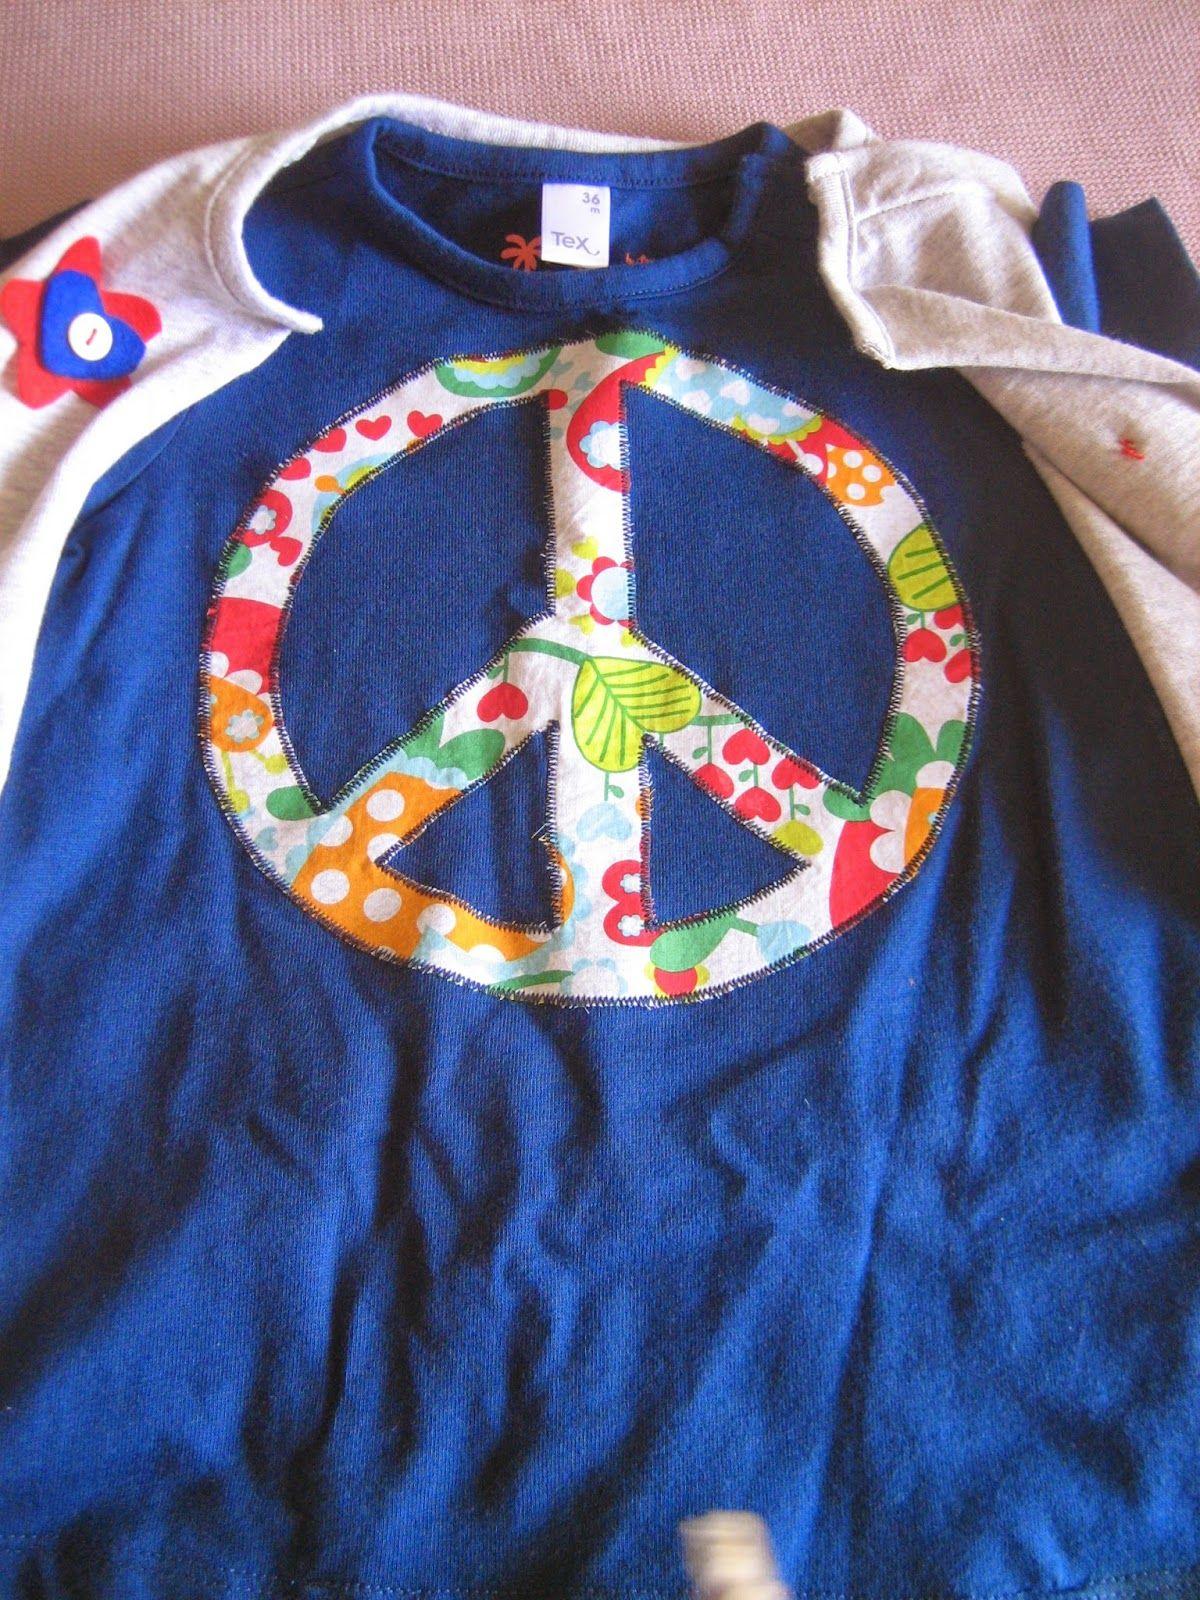 Chimcatapum Disfraz De Hippie Camisetas Decoradas Pinterest  ~ Ideas Para Decorar Camisetas Infantiles